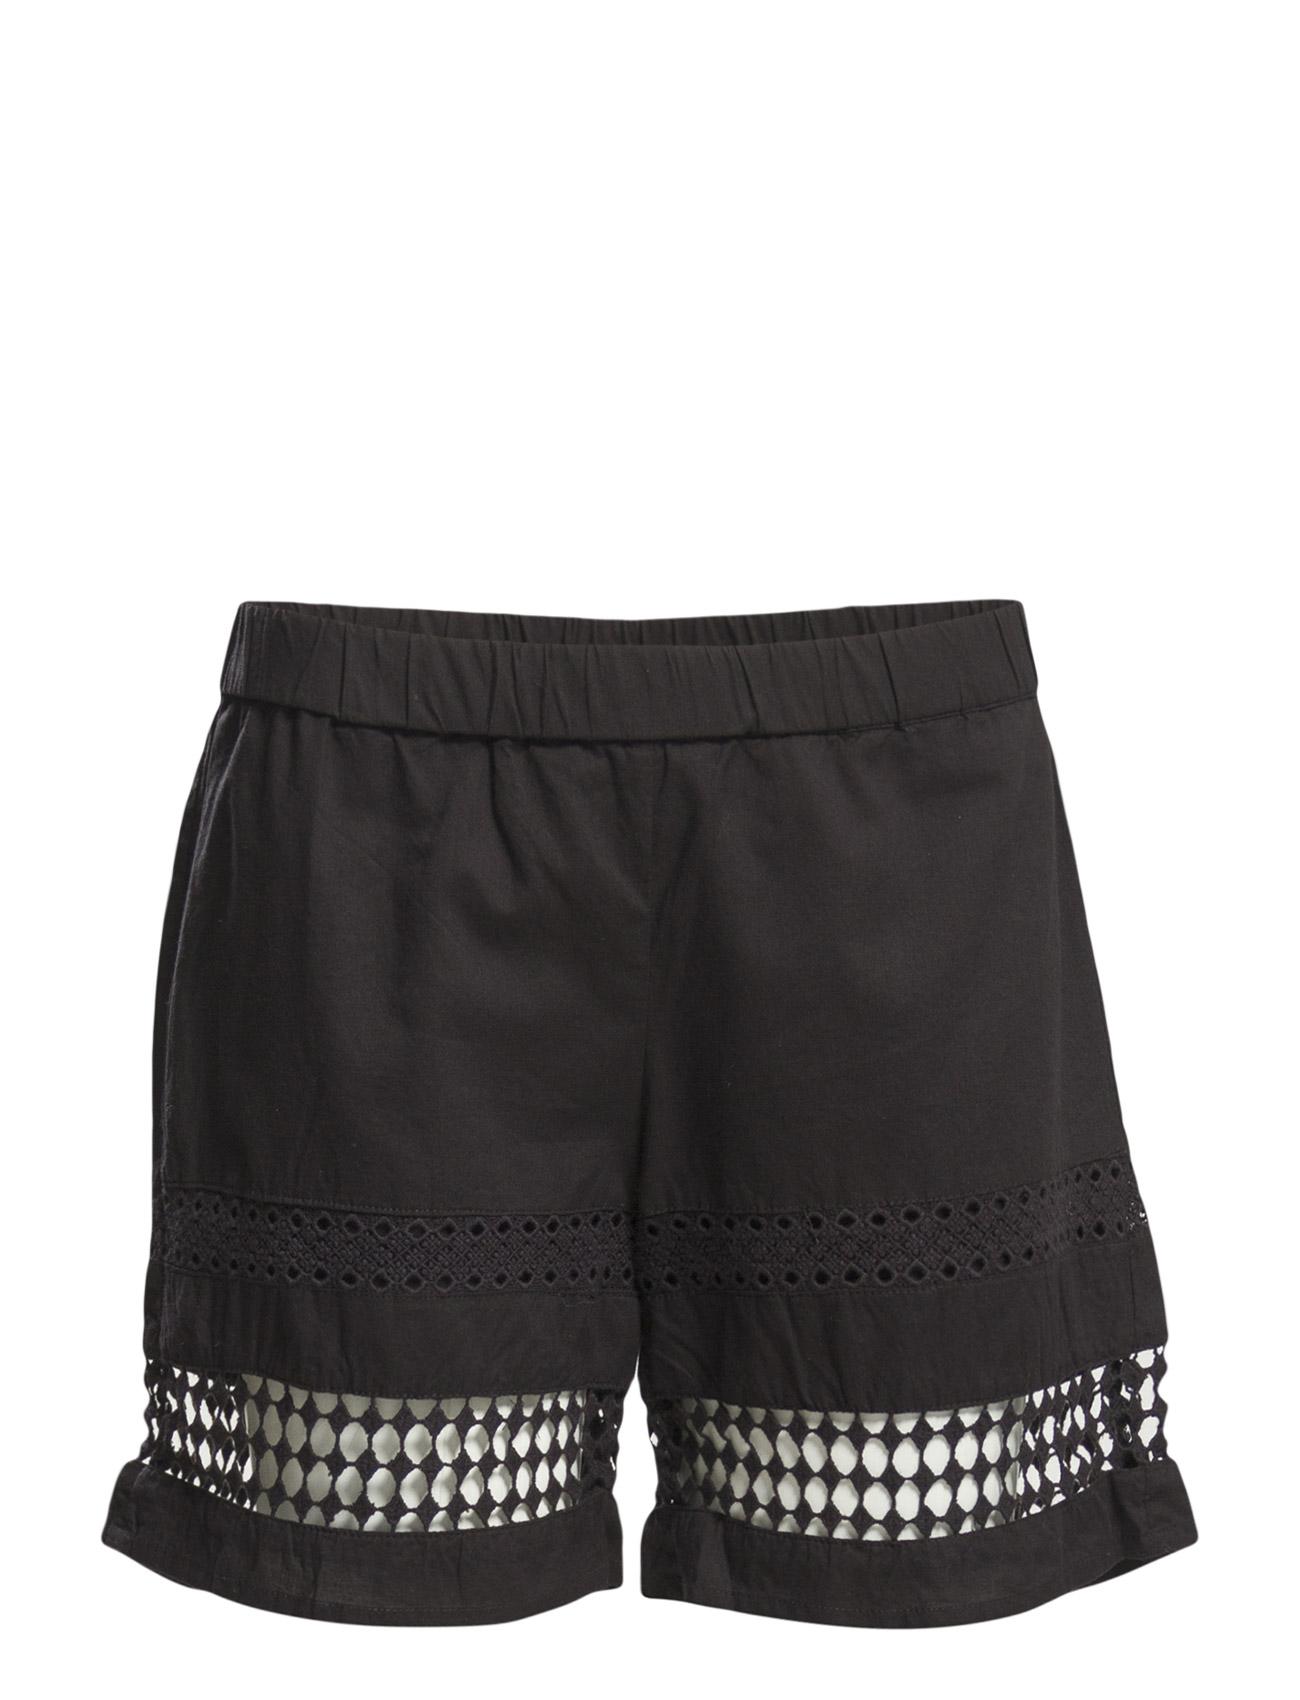 Lace Band Shorts